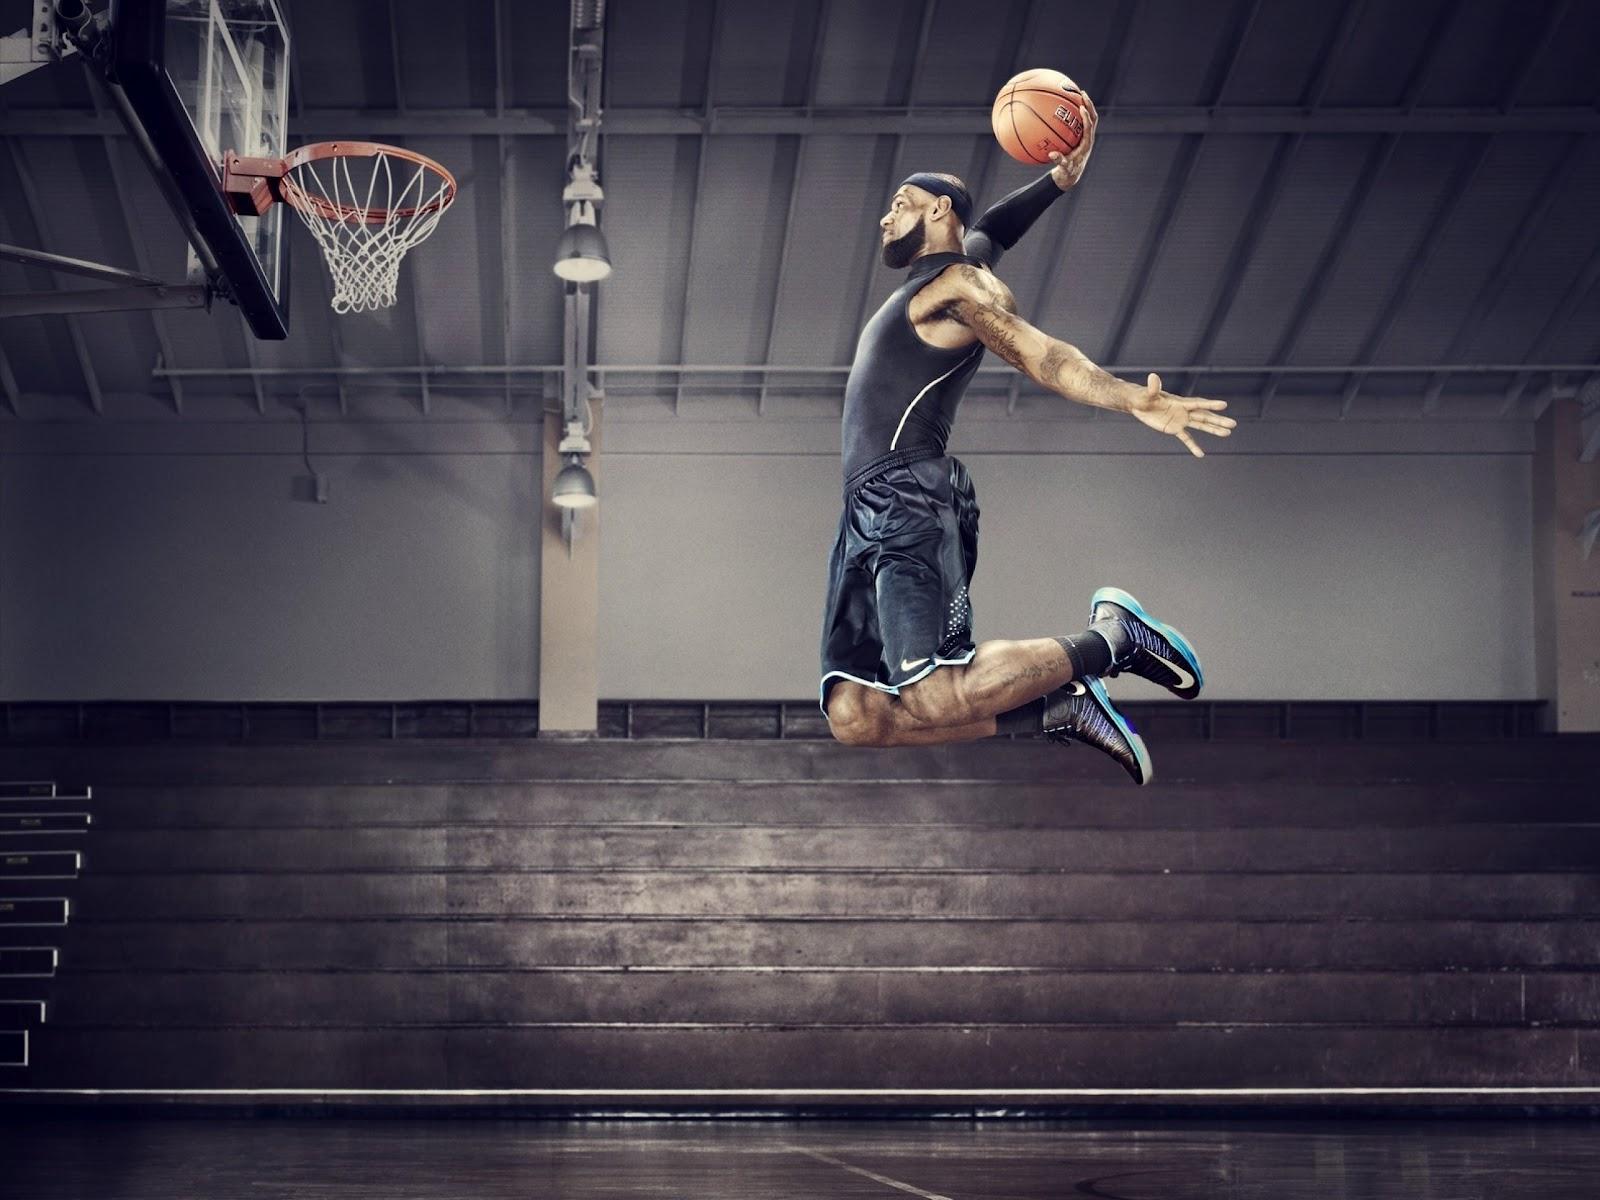 Hi84 Lebron James Nba Basketball Dunk Wallpaper: LEBRON JAMES NBA BASKETBALL DUNK WALLPAPER